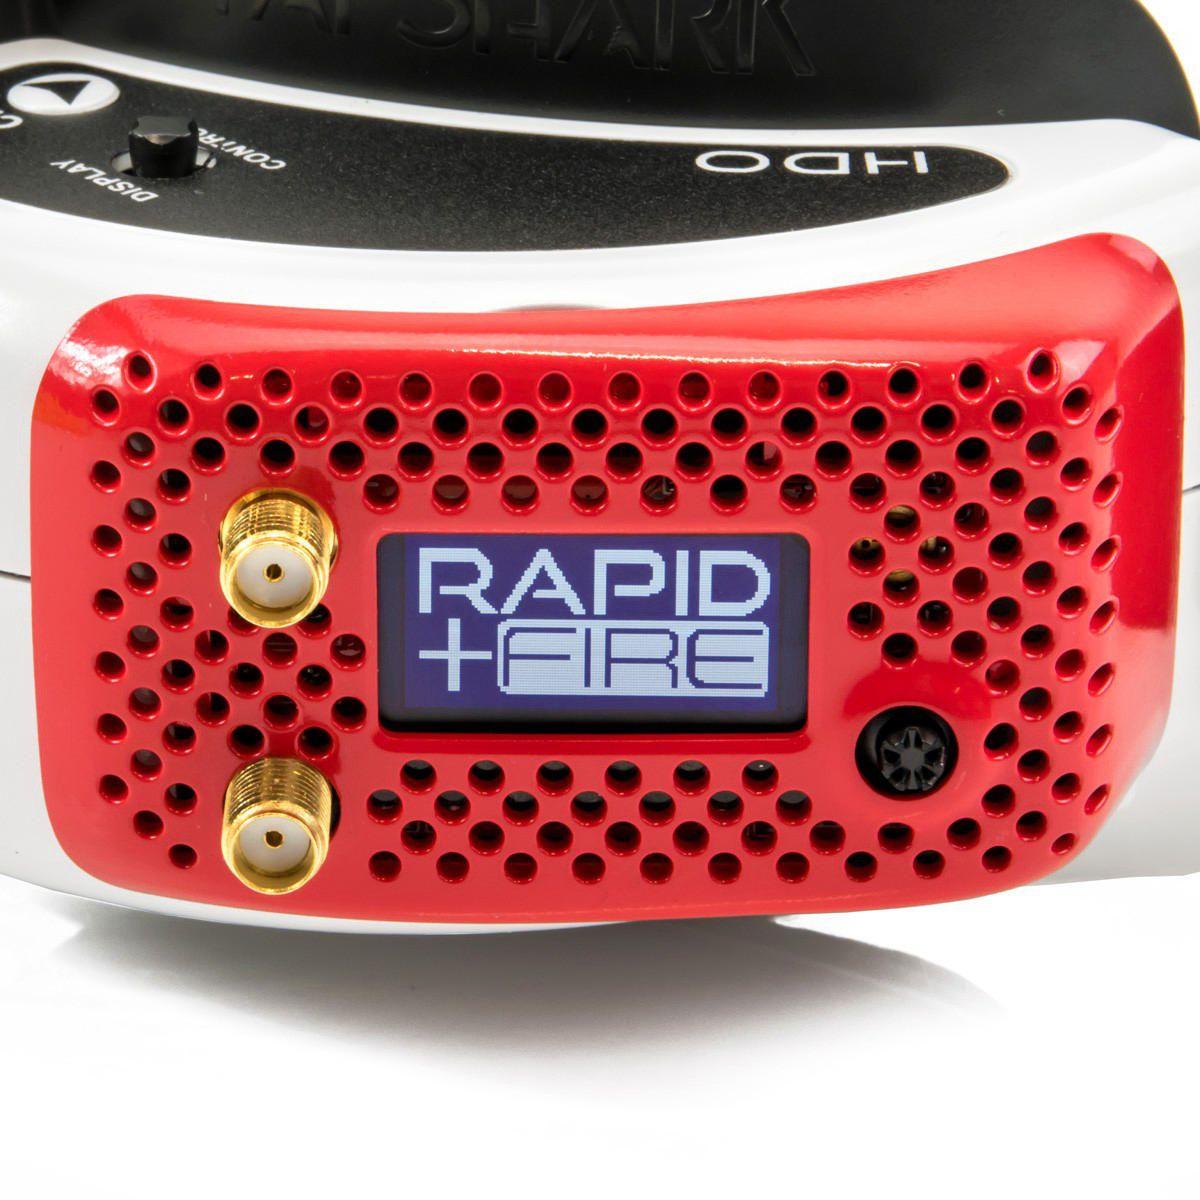 ImmersionRC Rapidfire Modul 114,78€ aus China